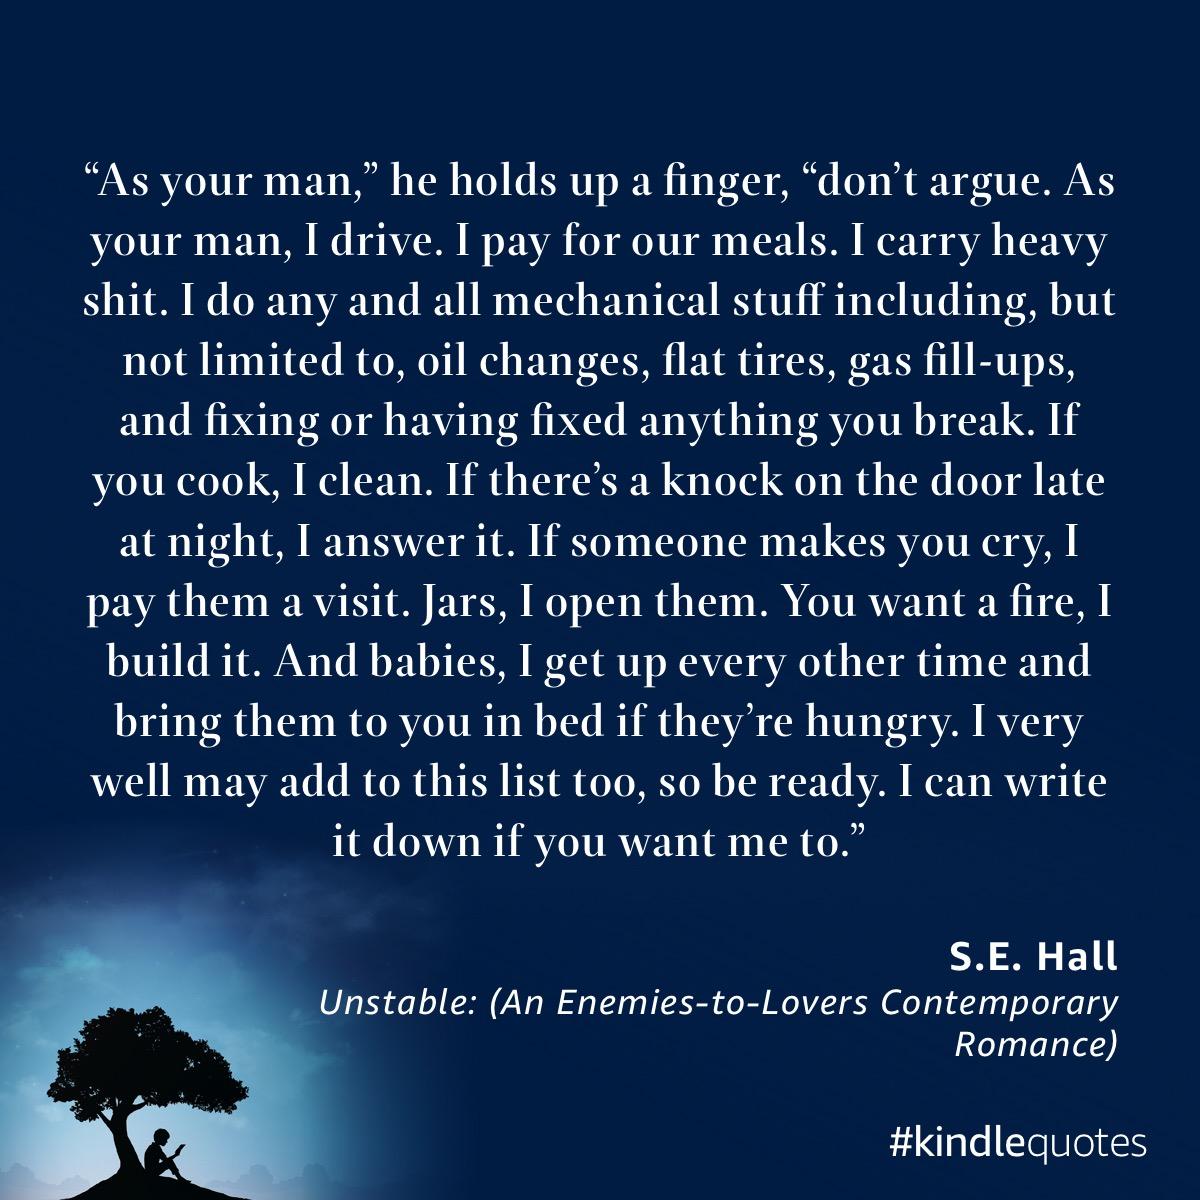 Book quote SE Hall